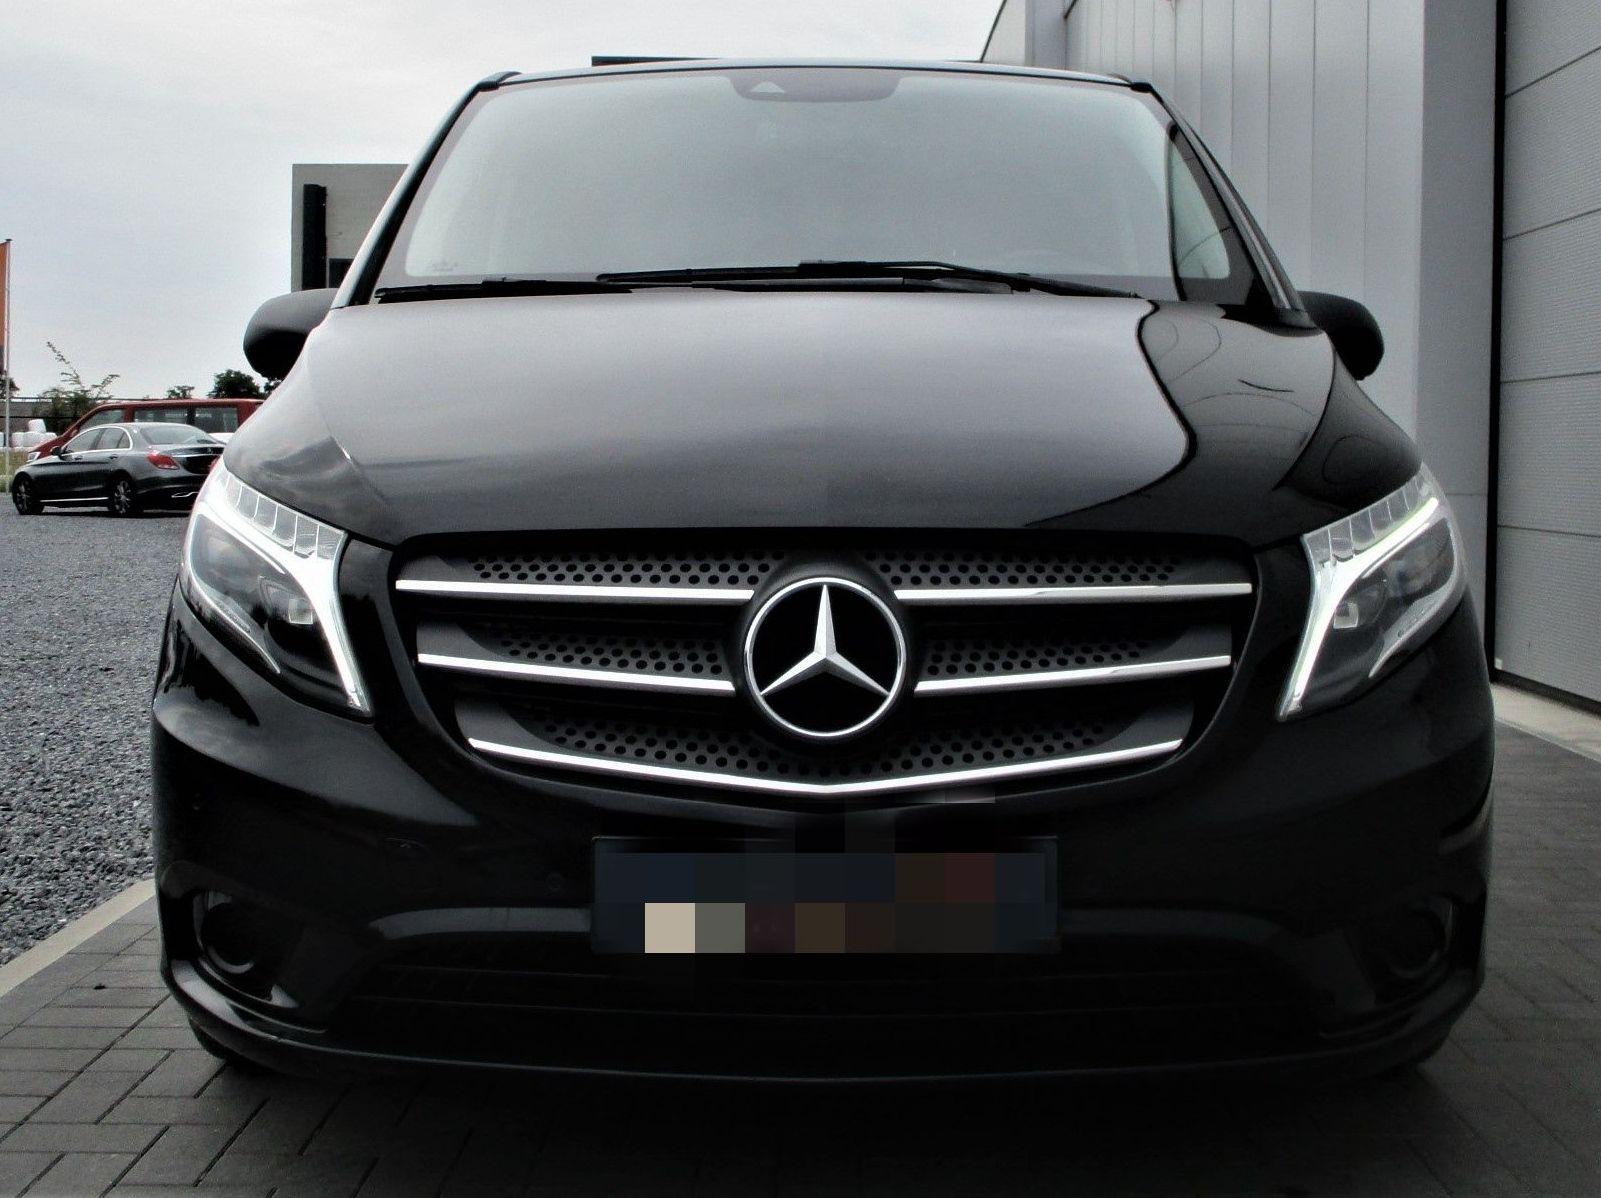 Taxi 9 Plazas: Mercedes Vito Select Extralarga: PRODUCTOS Y SERVICIOS  de Autotaxi Eliseo